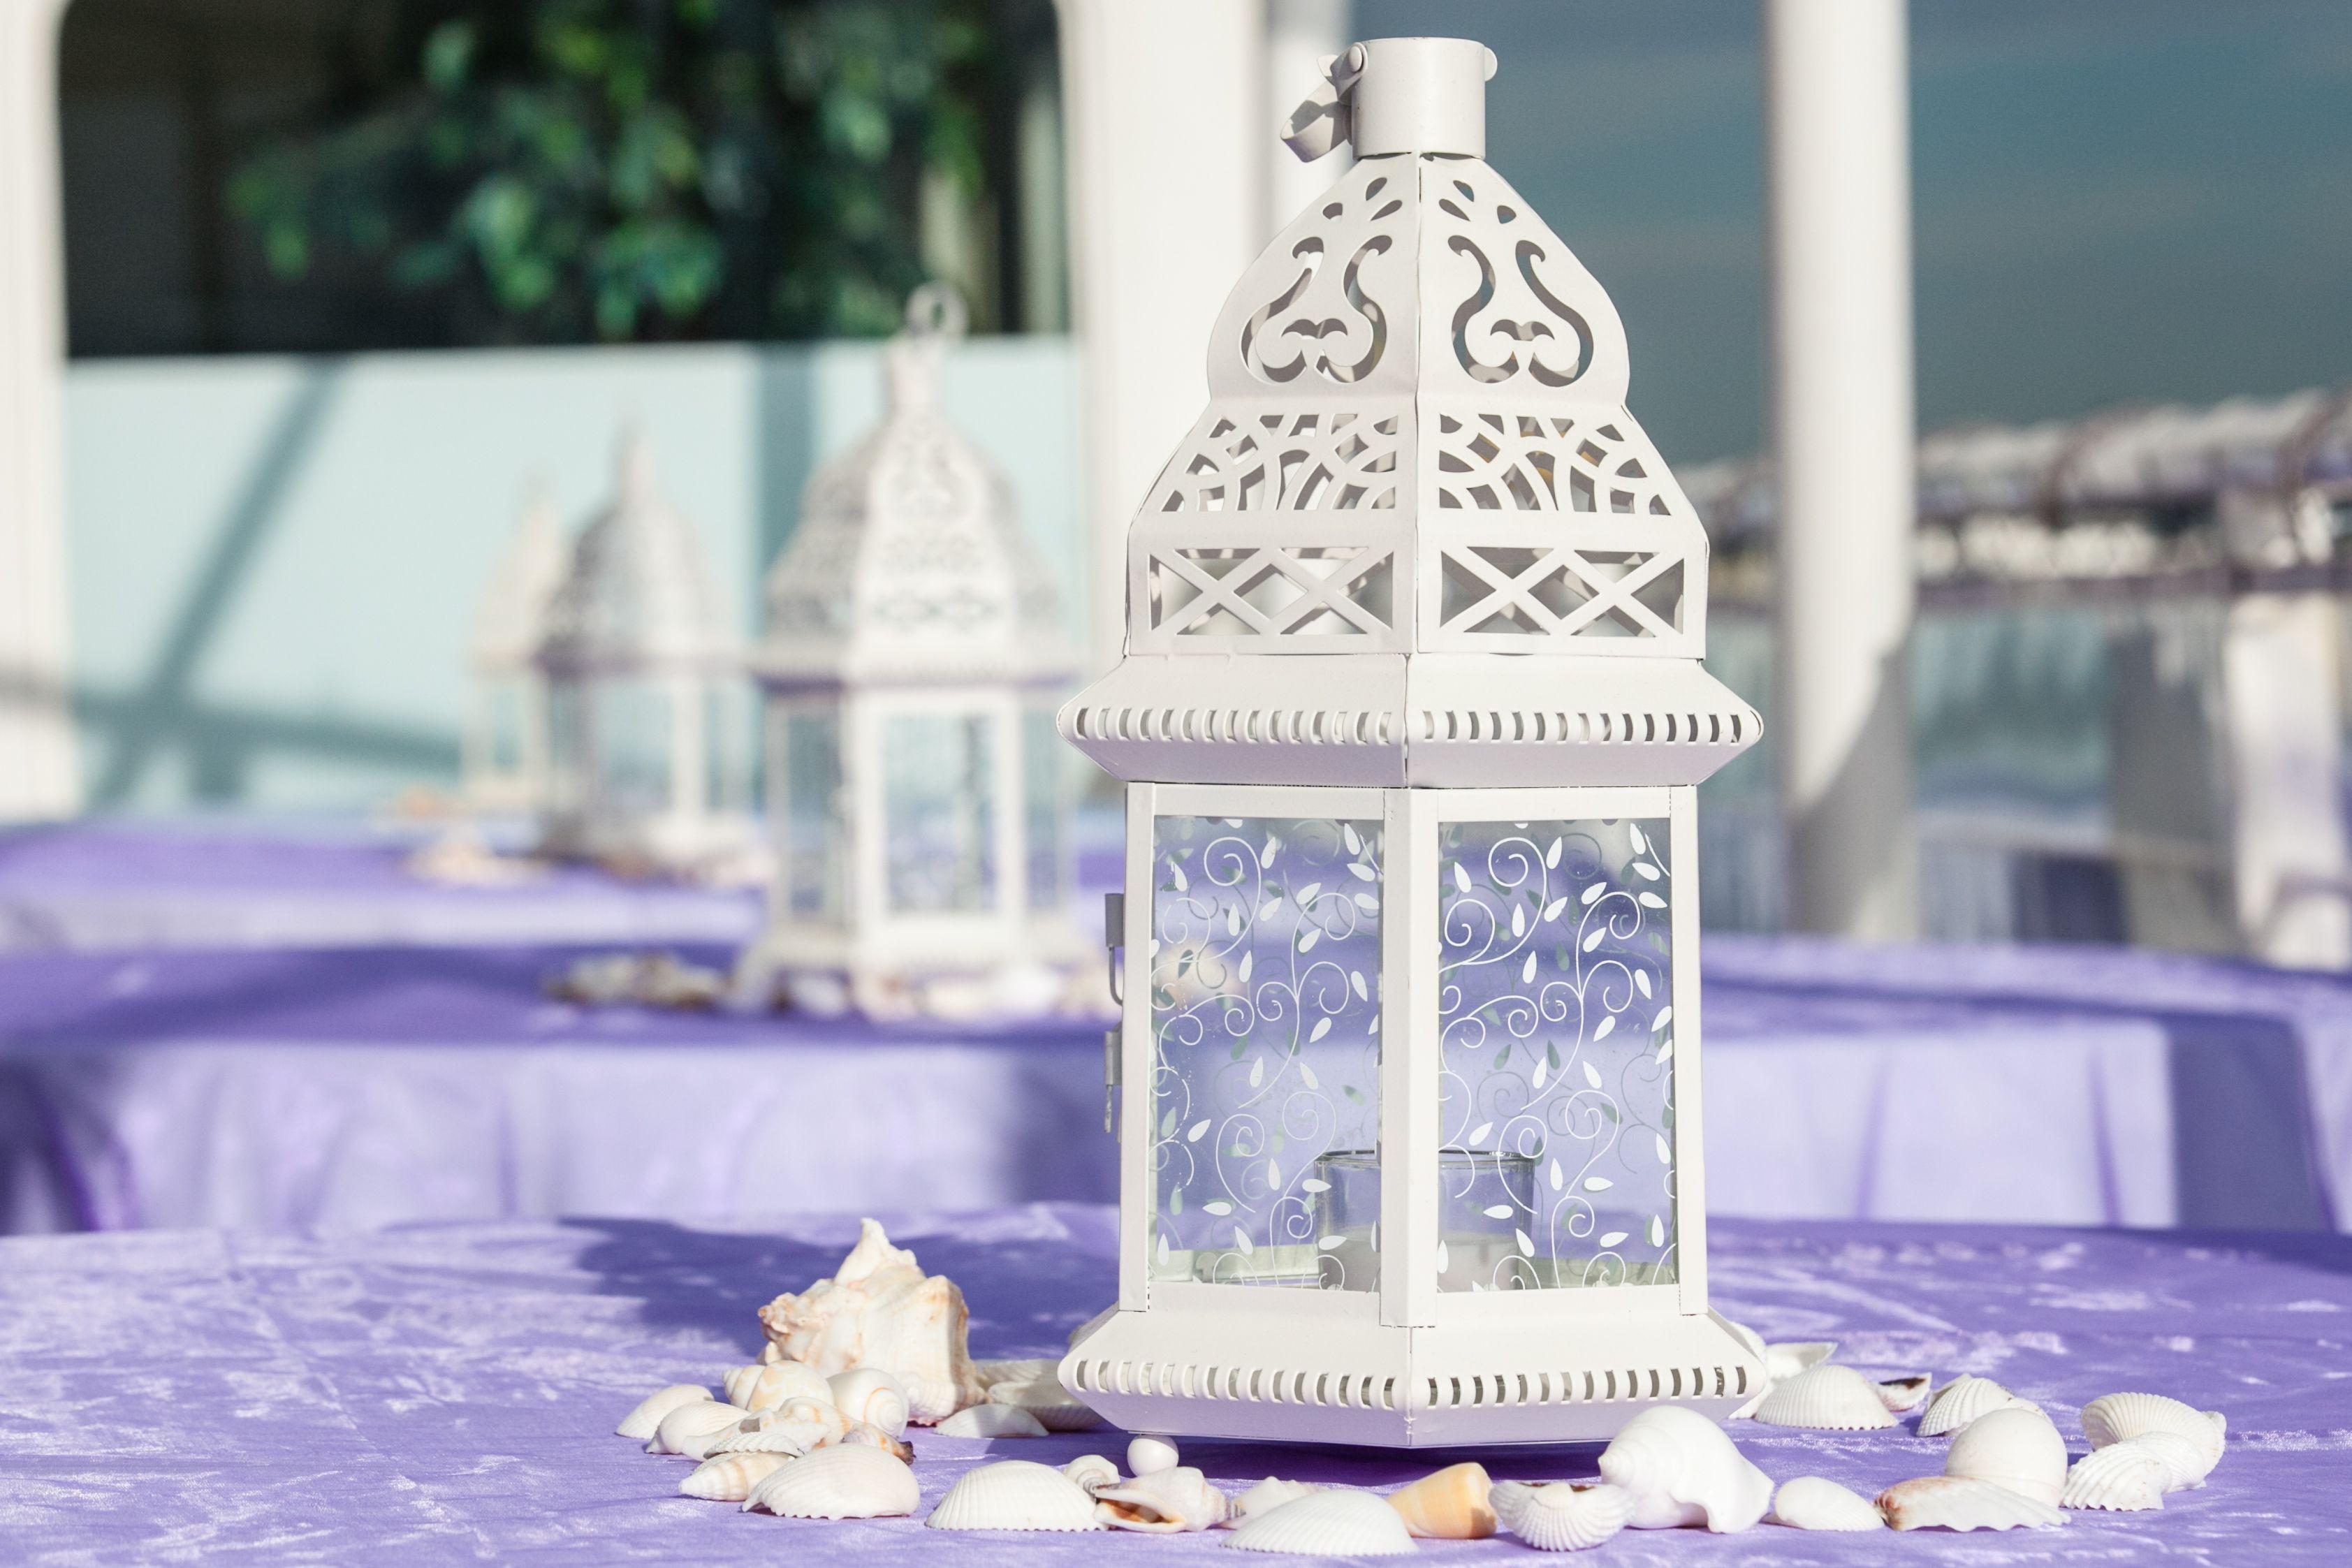 Moroccan Lantern Centerpieces With Seashells Wedding Table